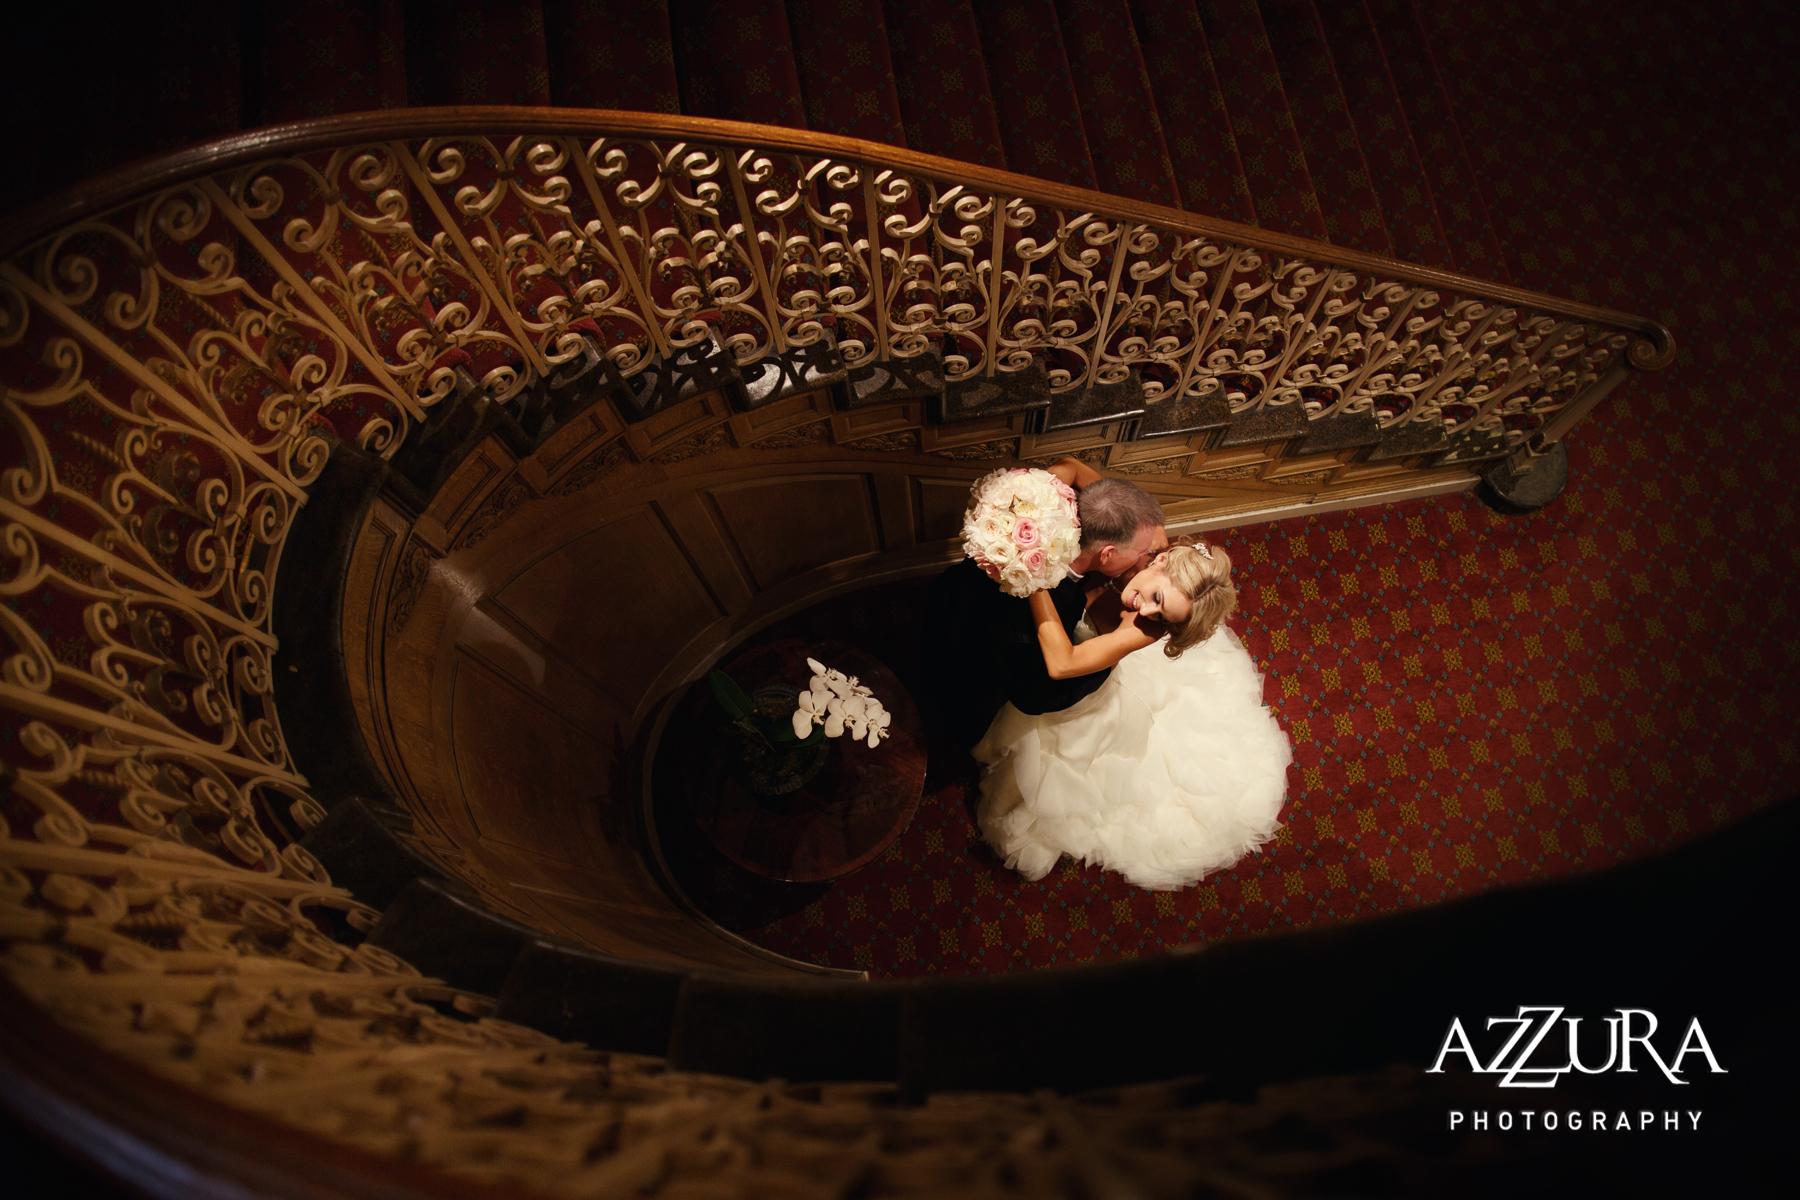 Azzura_Photography_0281.jpg